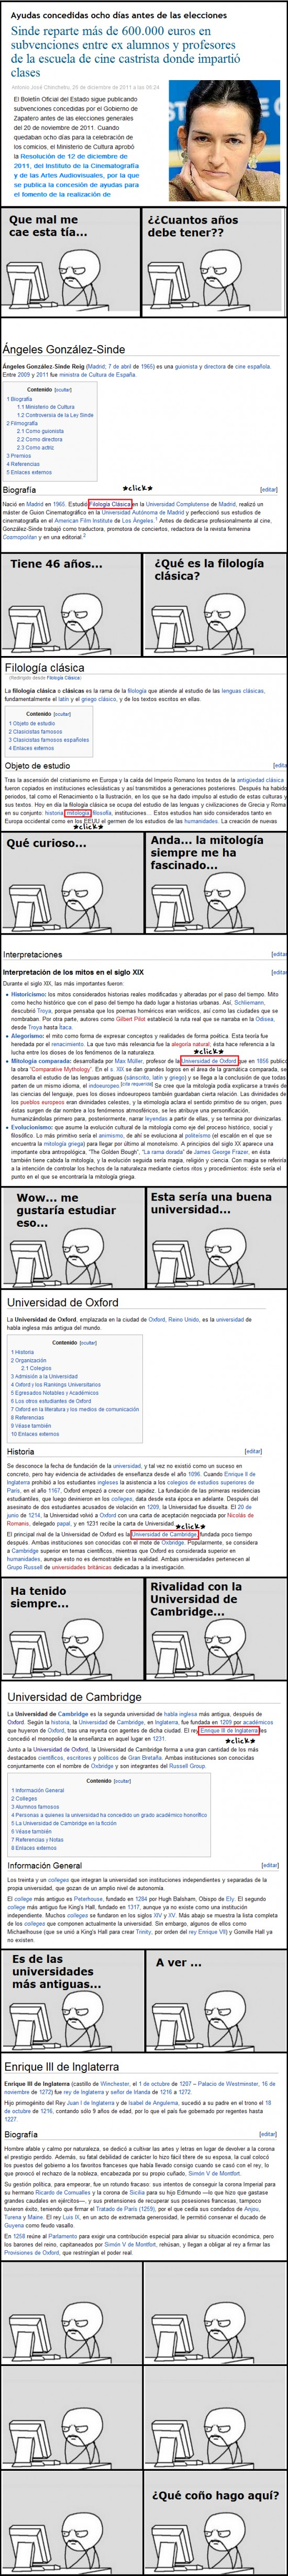 Computer_guy - El maravilloso mundo de la wikipedia